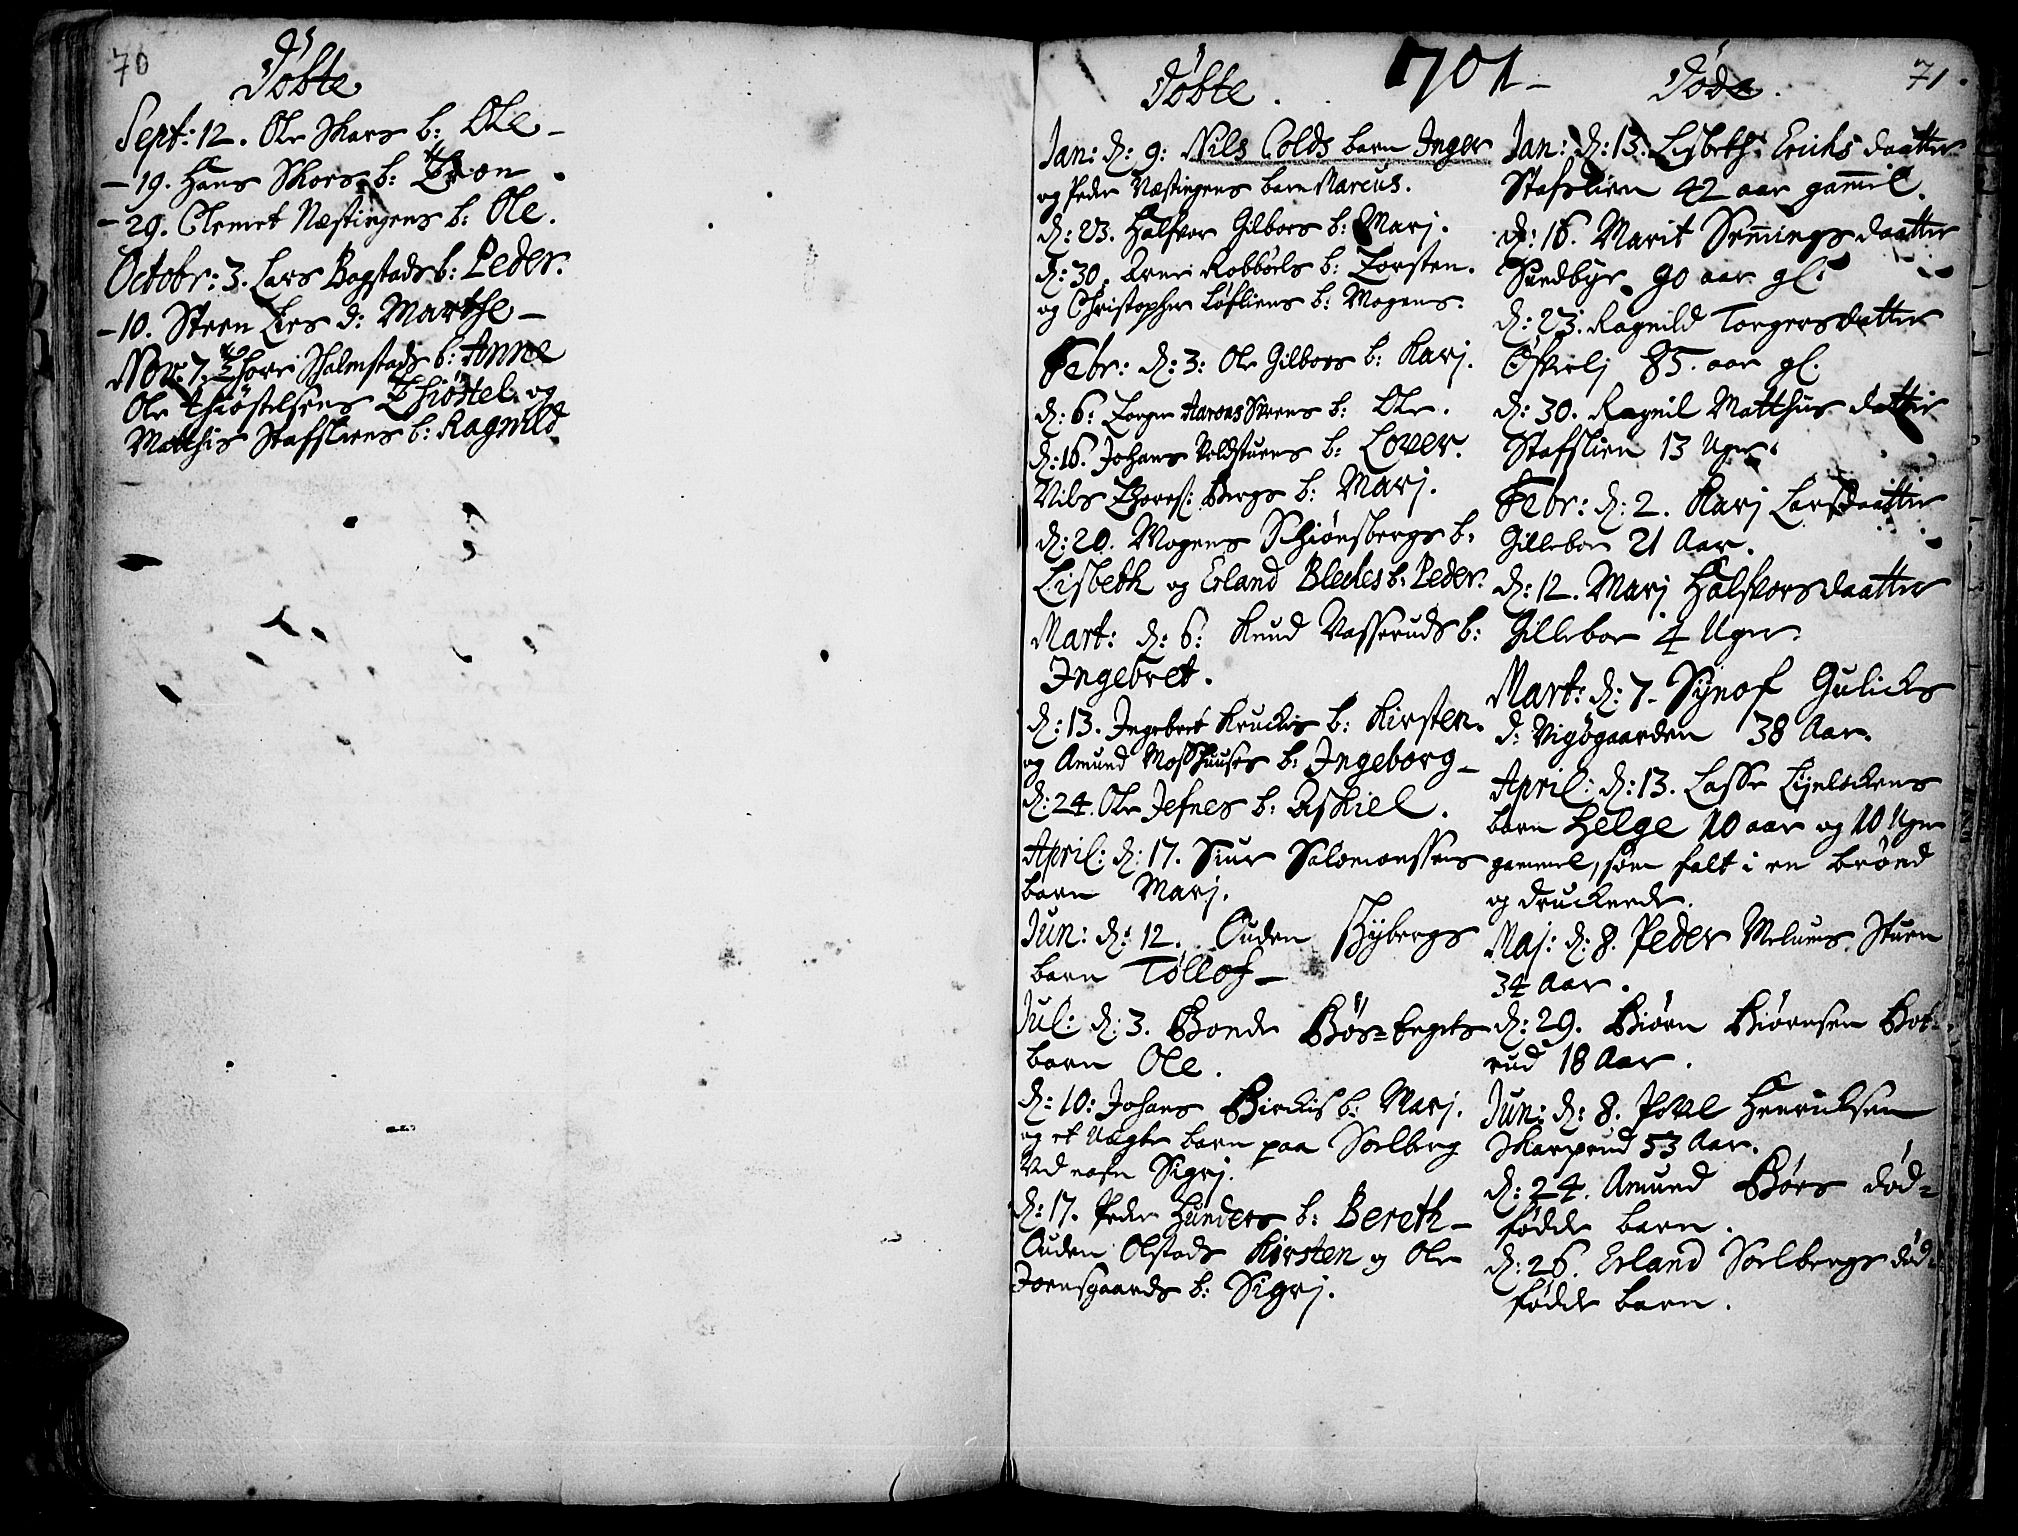 SAH, Øyer prestekontor, Ministerialbok nr. 1, 1671-1727, s. 70-71